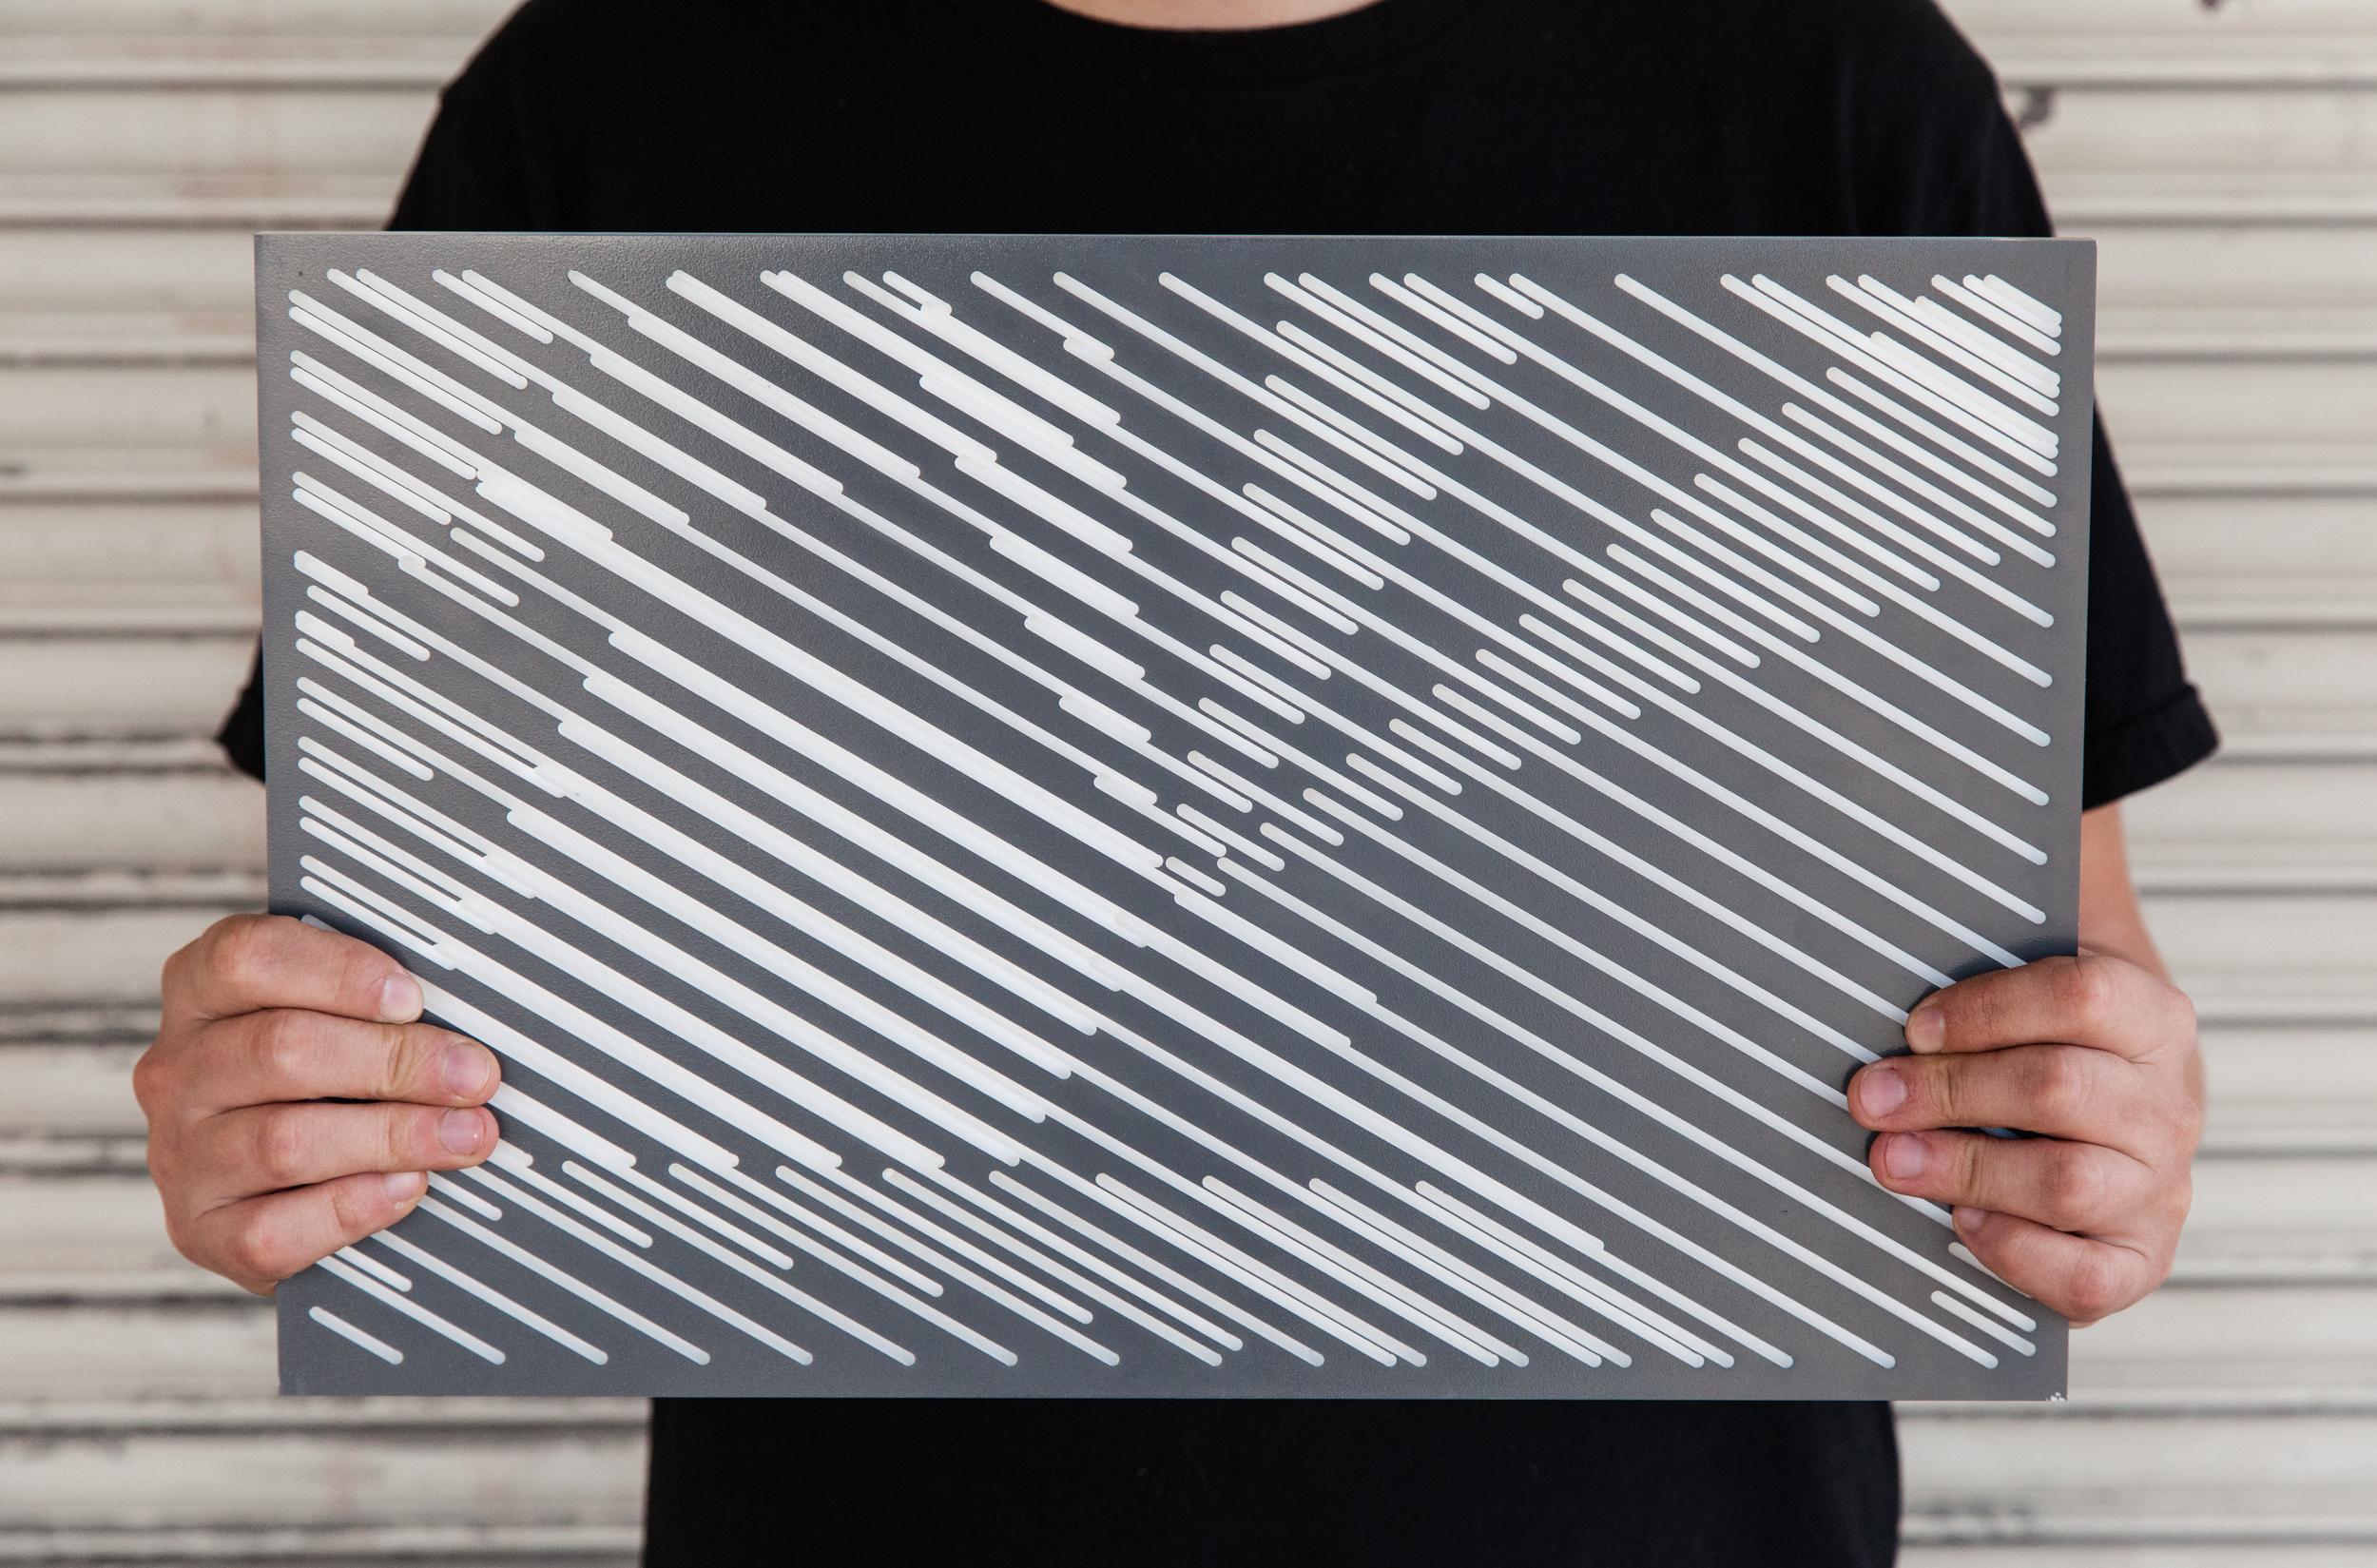 asteriskos-design-fabrication-cnc-art-solid-surface-graphic-pattern- hold.jpg